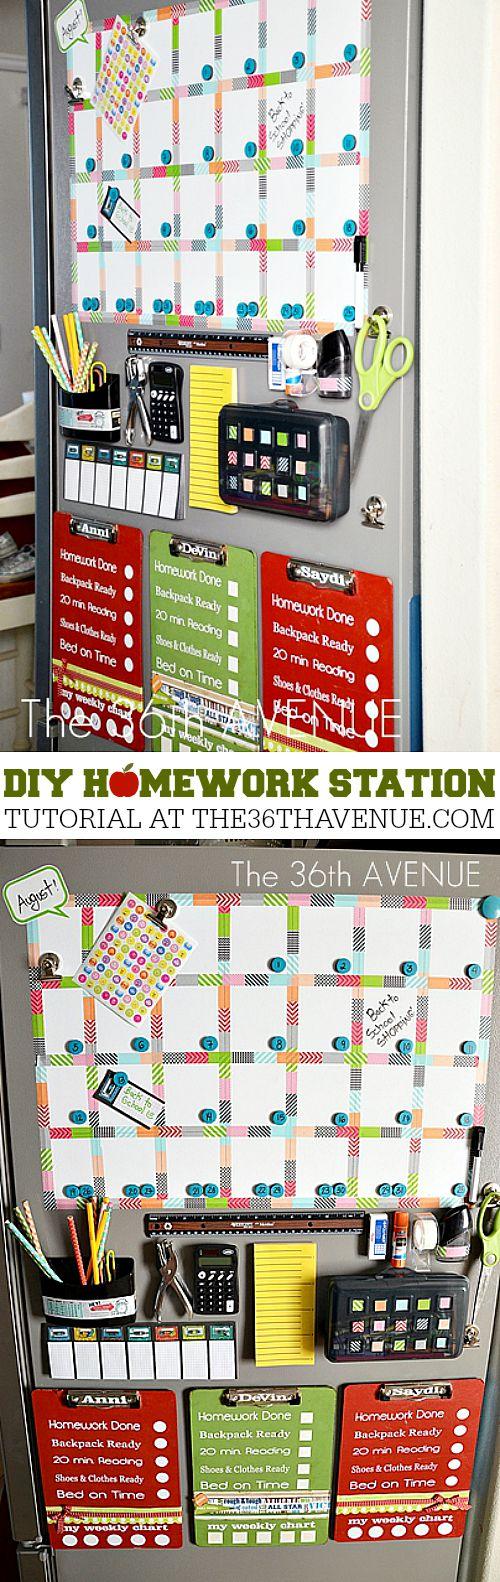 DIY-Homework-Station-at-the36thavenue.com-